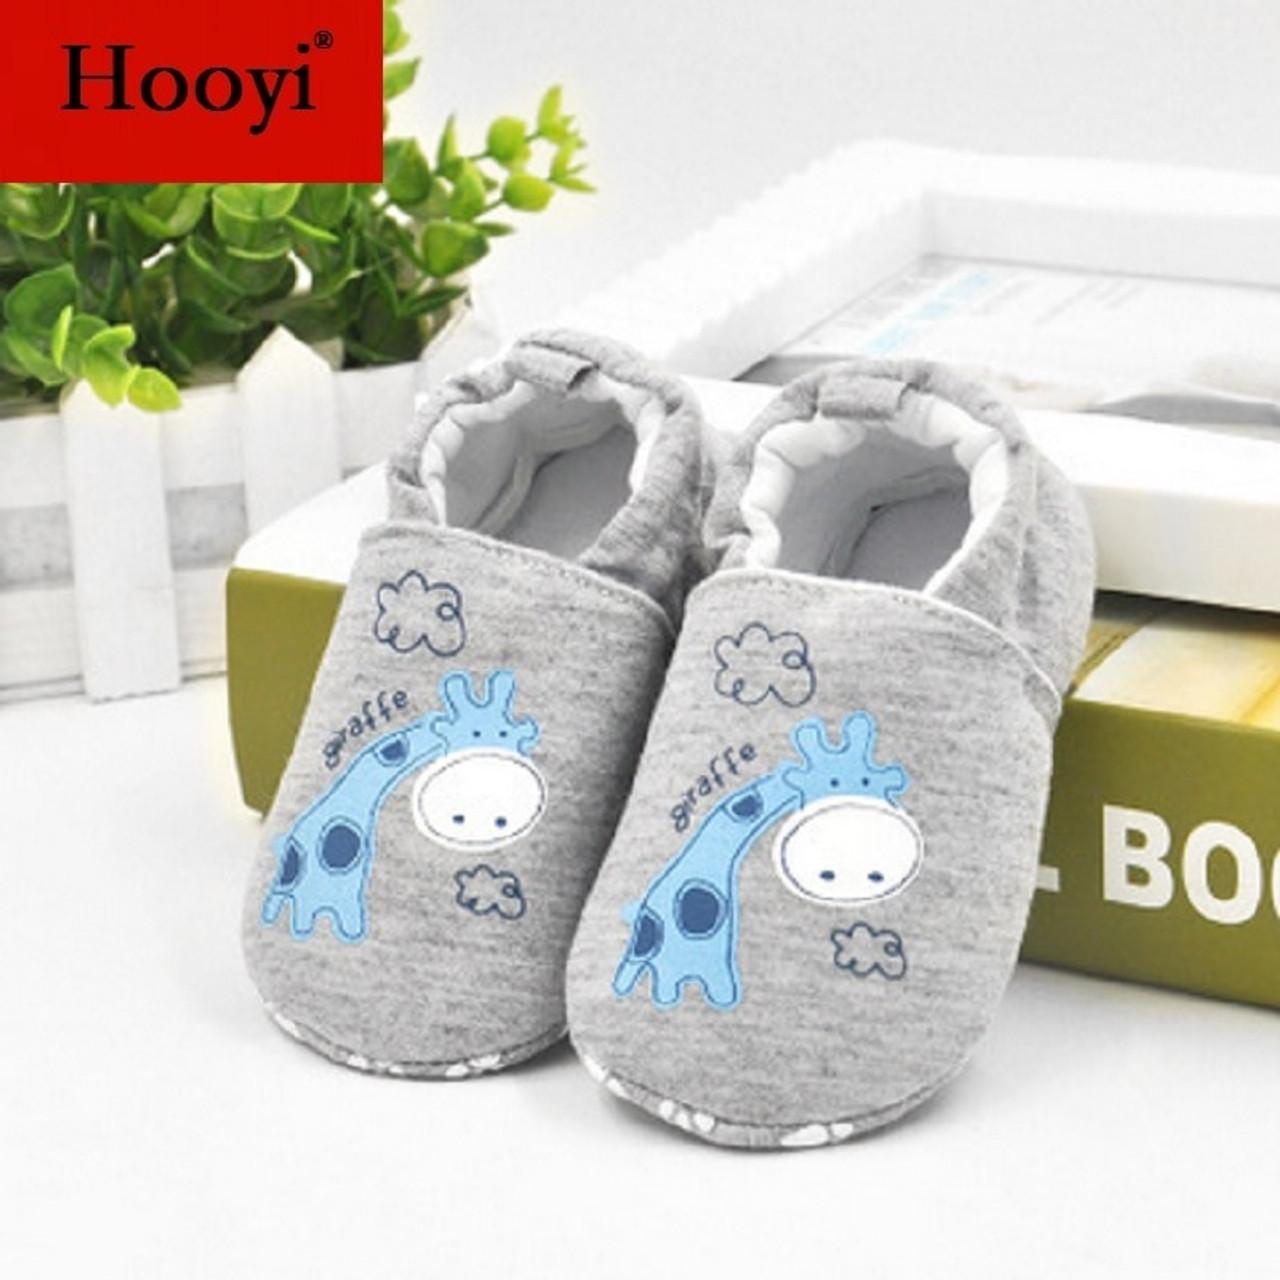 7d0d92c12590c Giraffe Hooyi Baby Boy Shoes Anti-Slip Newborn Shoe Cotton Children  Sneakers Toddler First Walkers ...